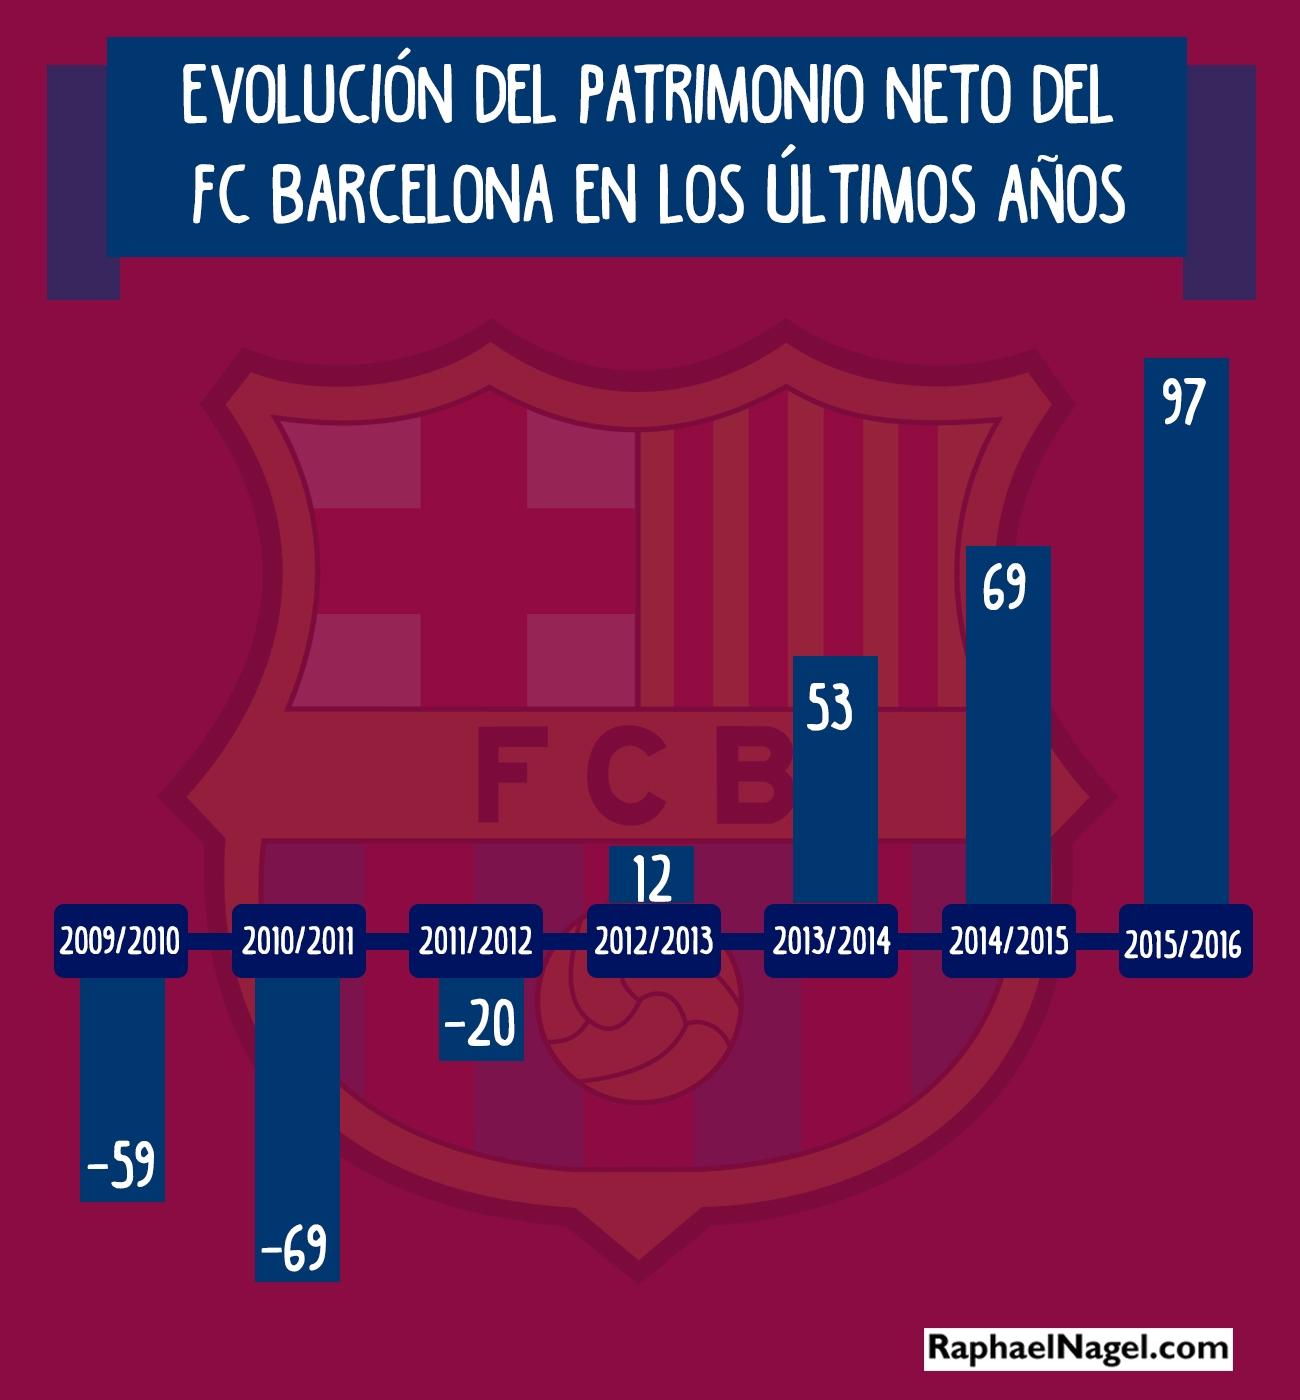 InfografiaFCBarcelona